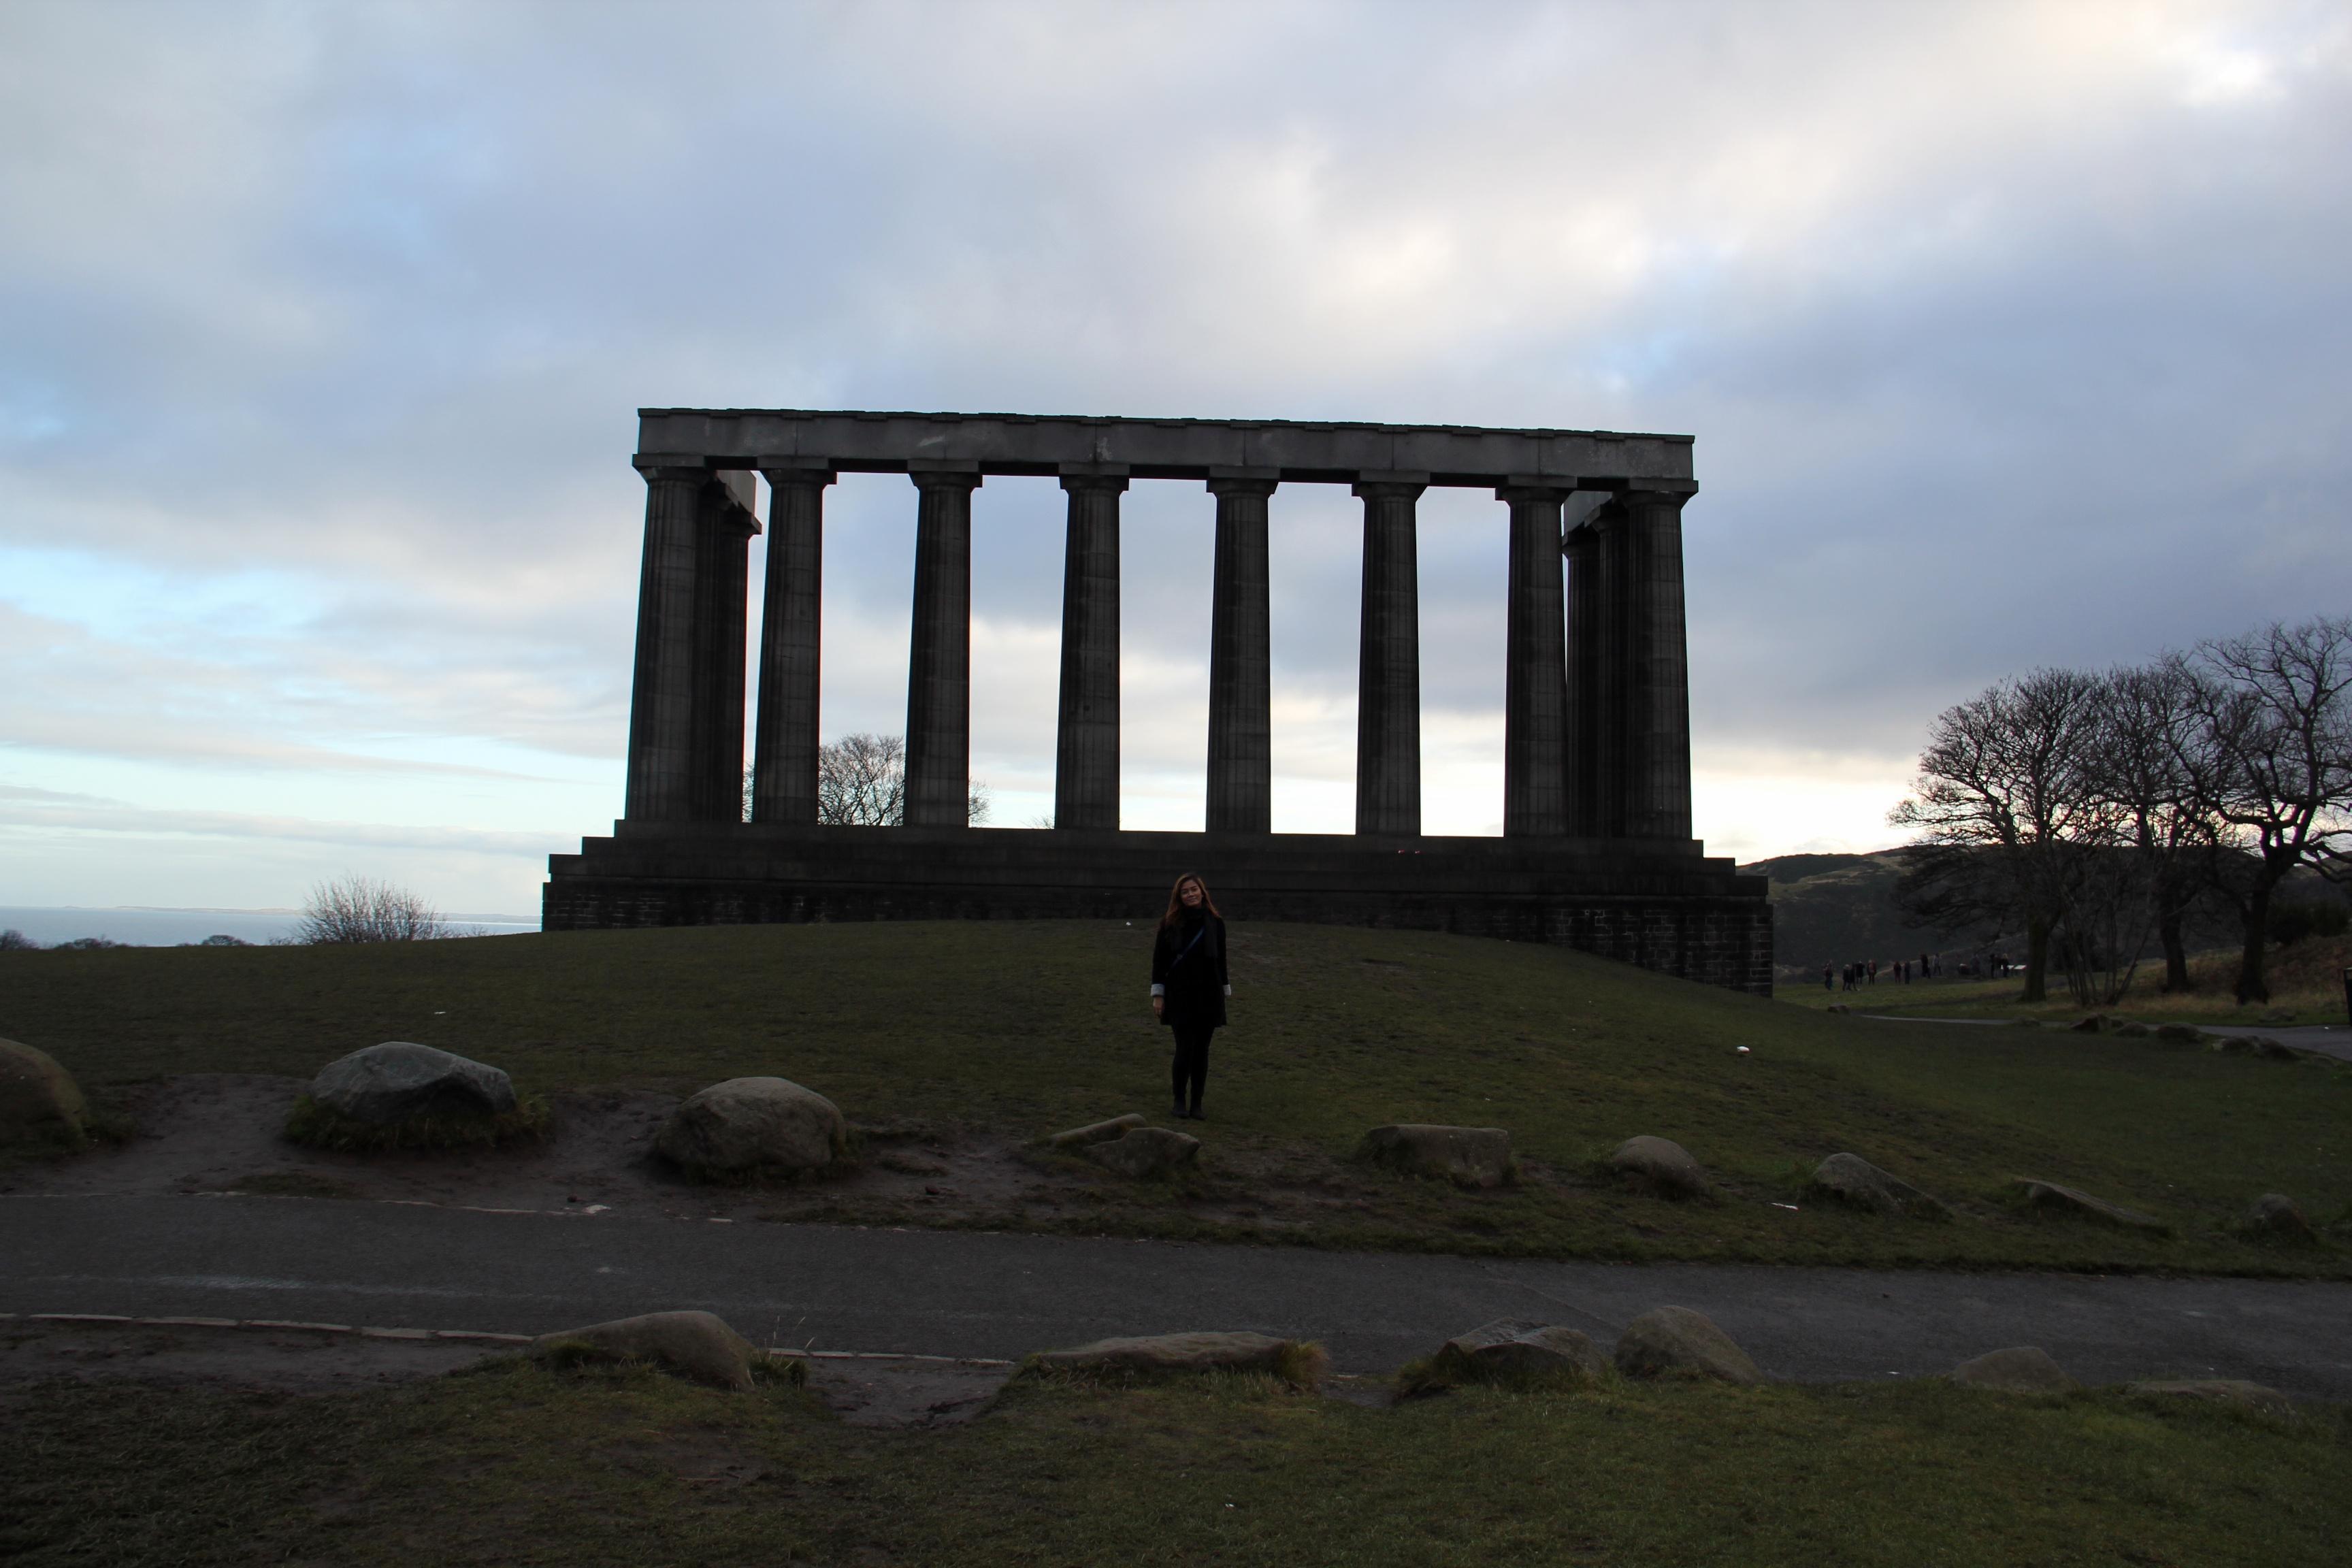 Edinburgh - The probing wife